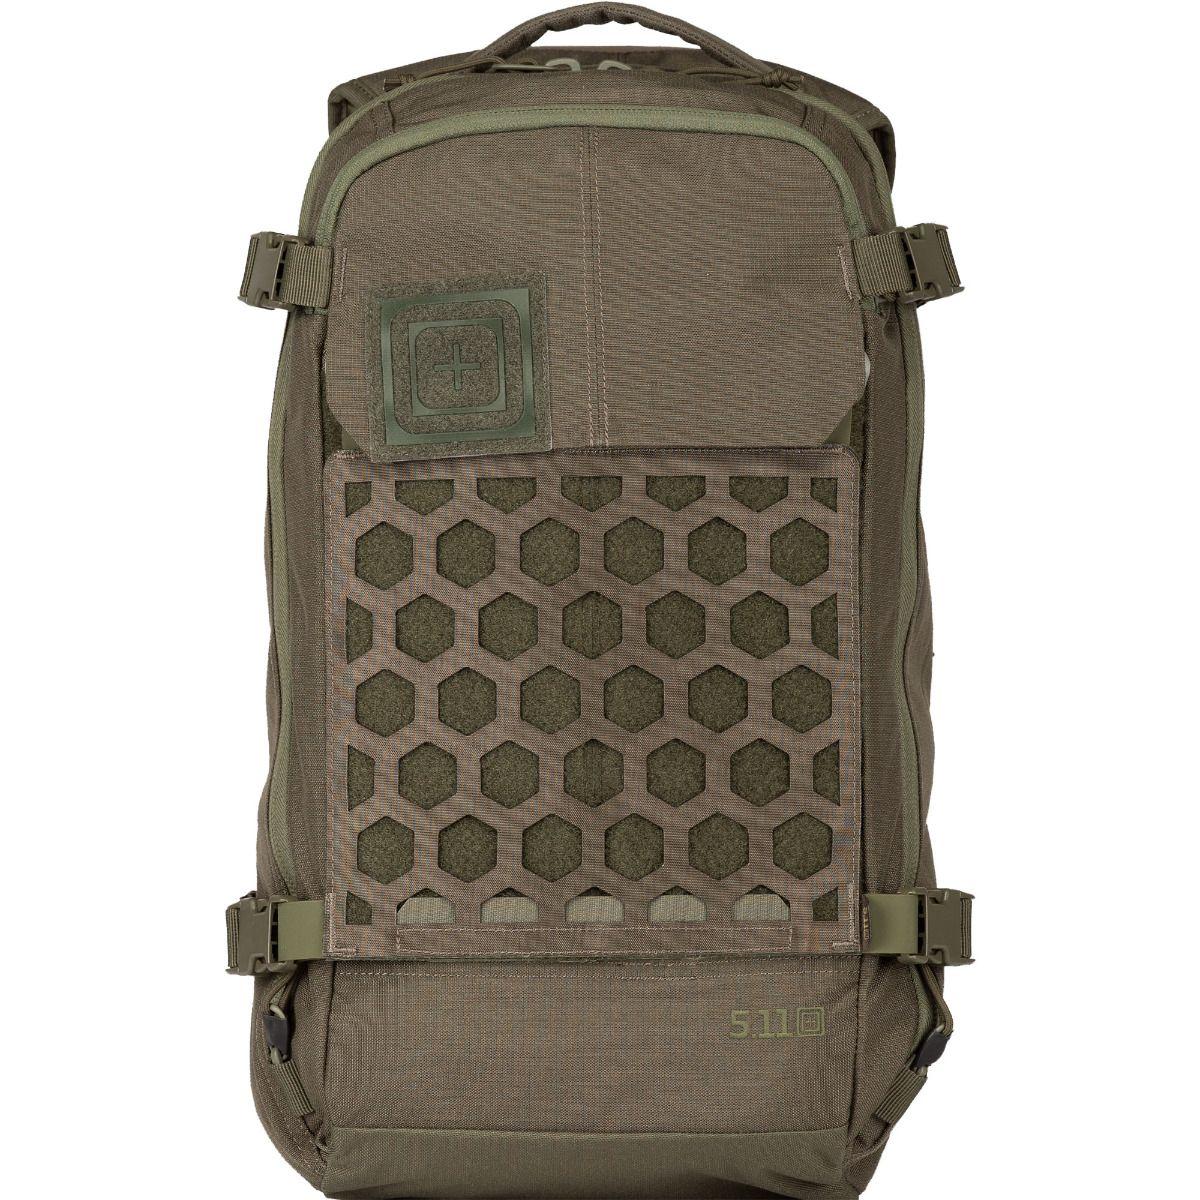 Balo 5.11 Tactical AMP12™ 25L – Ranger Green